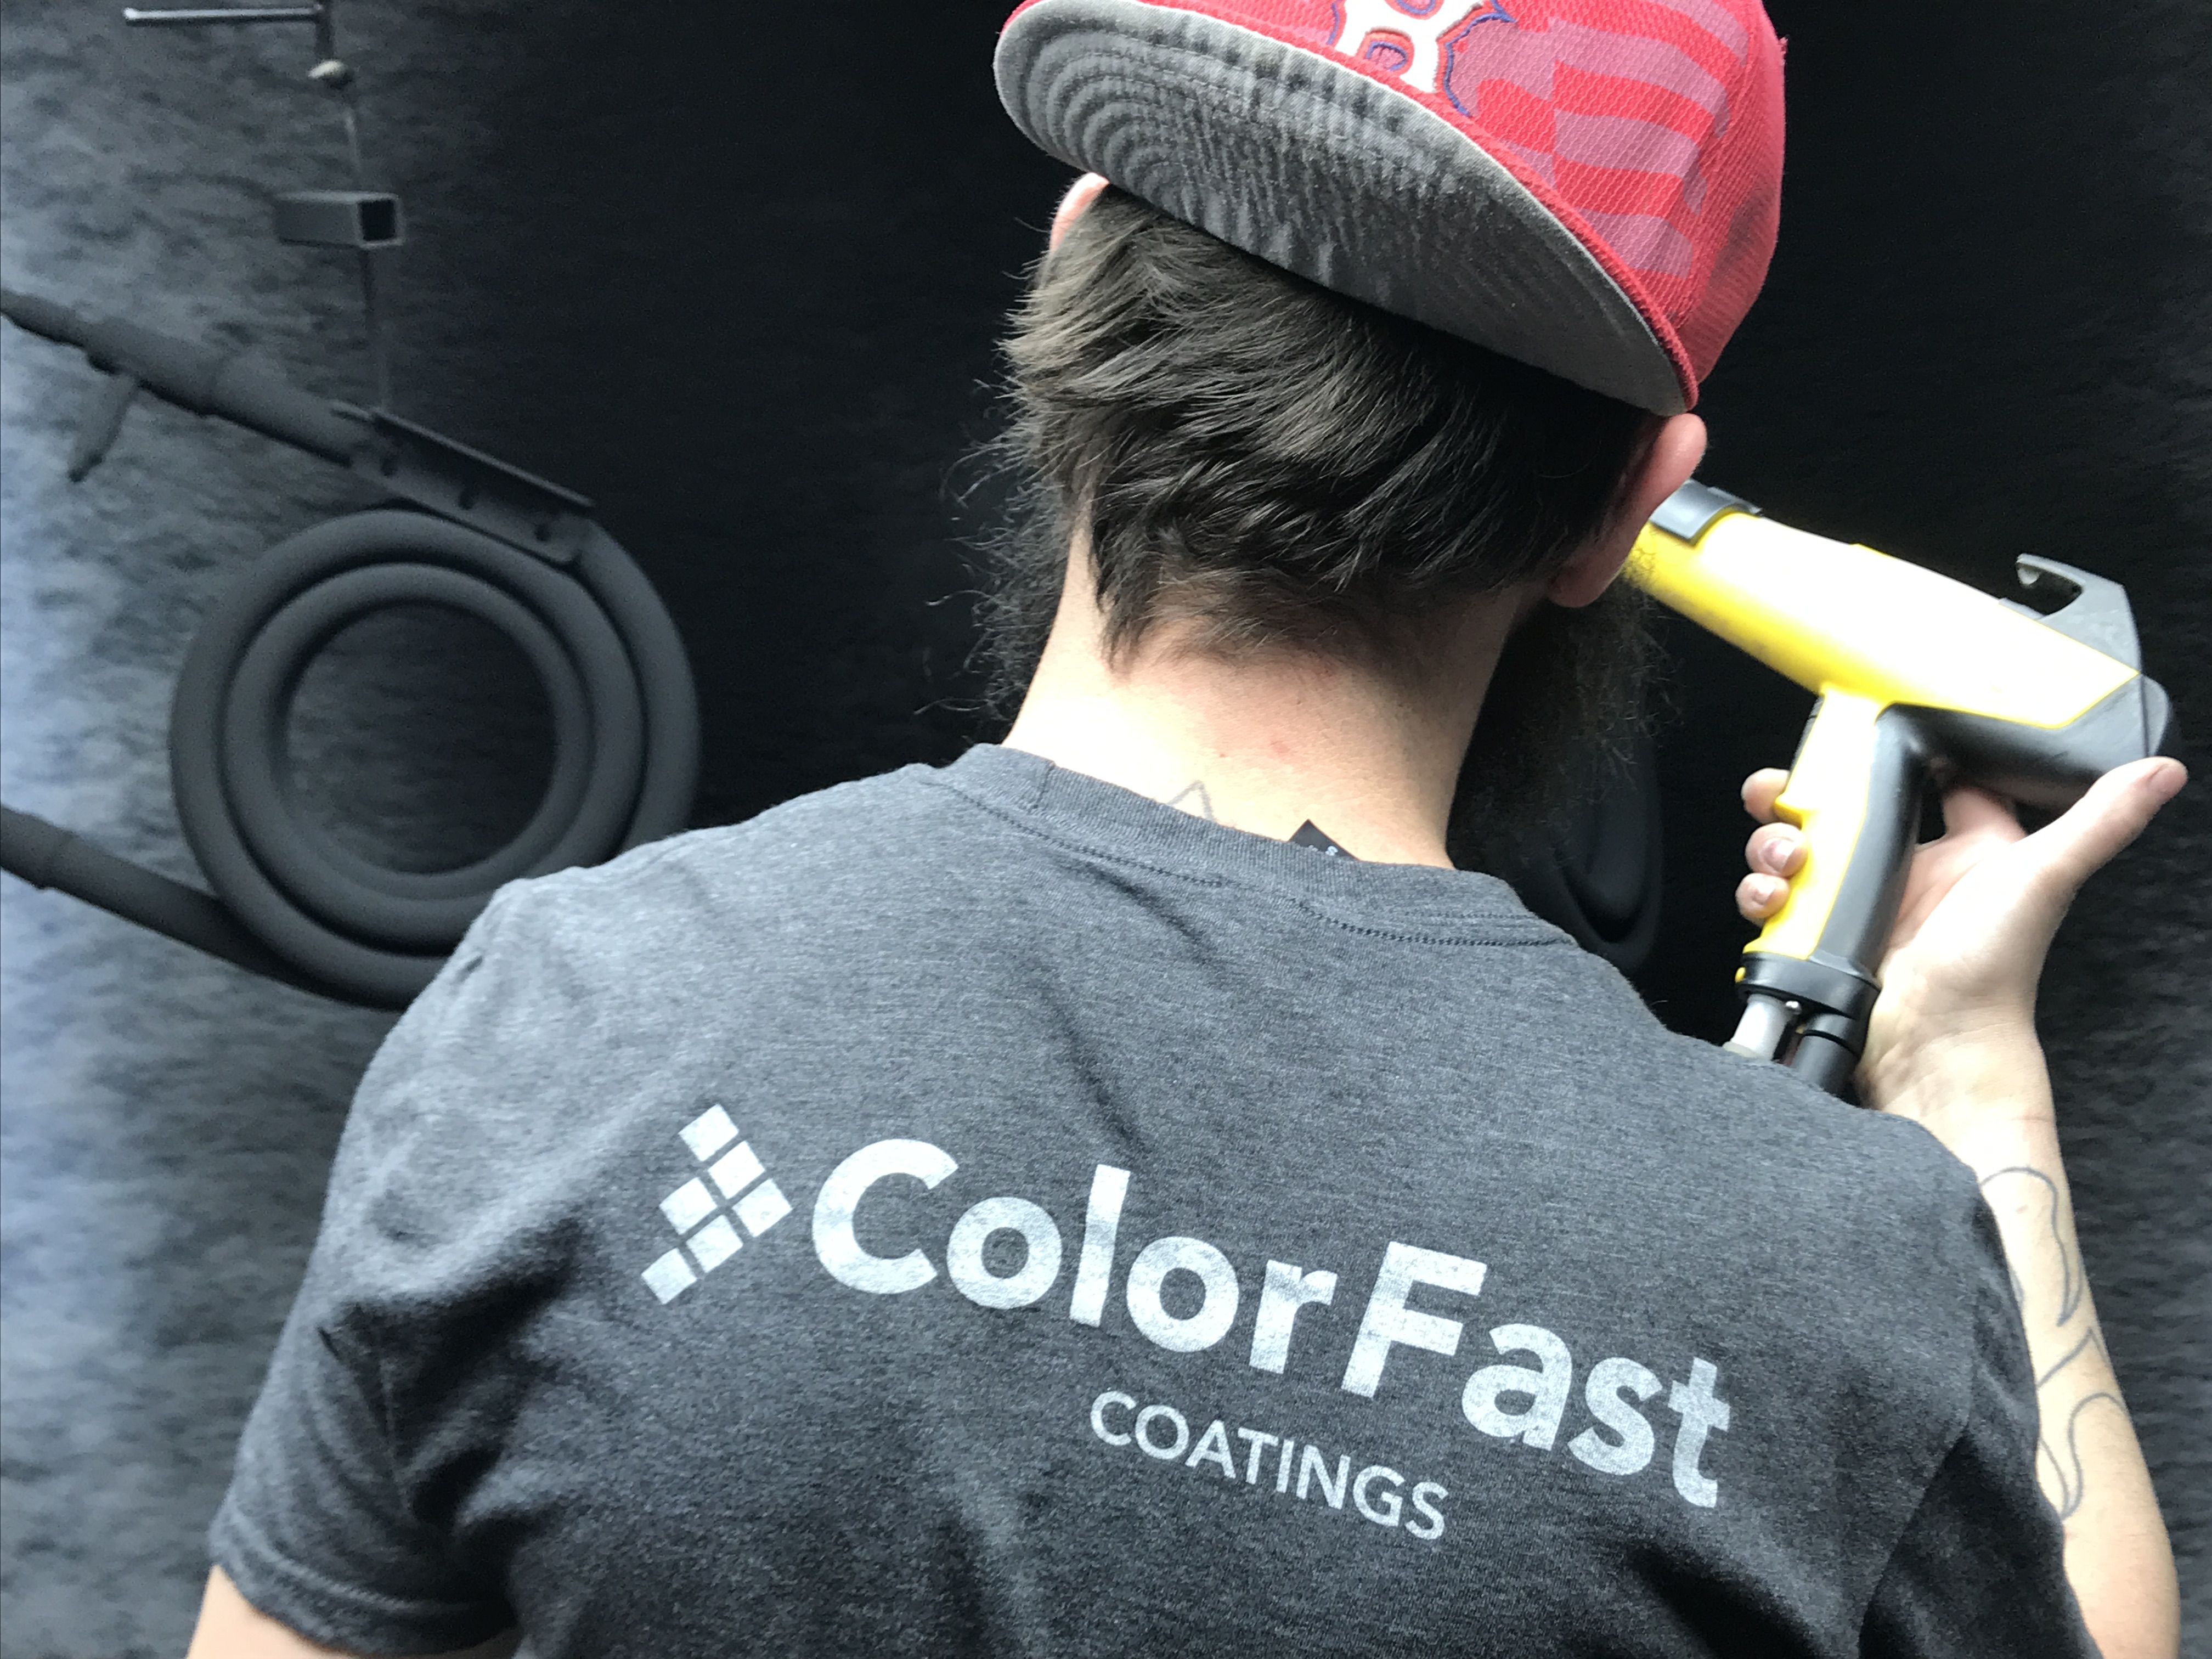 ColorFast Coatings